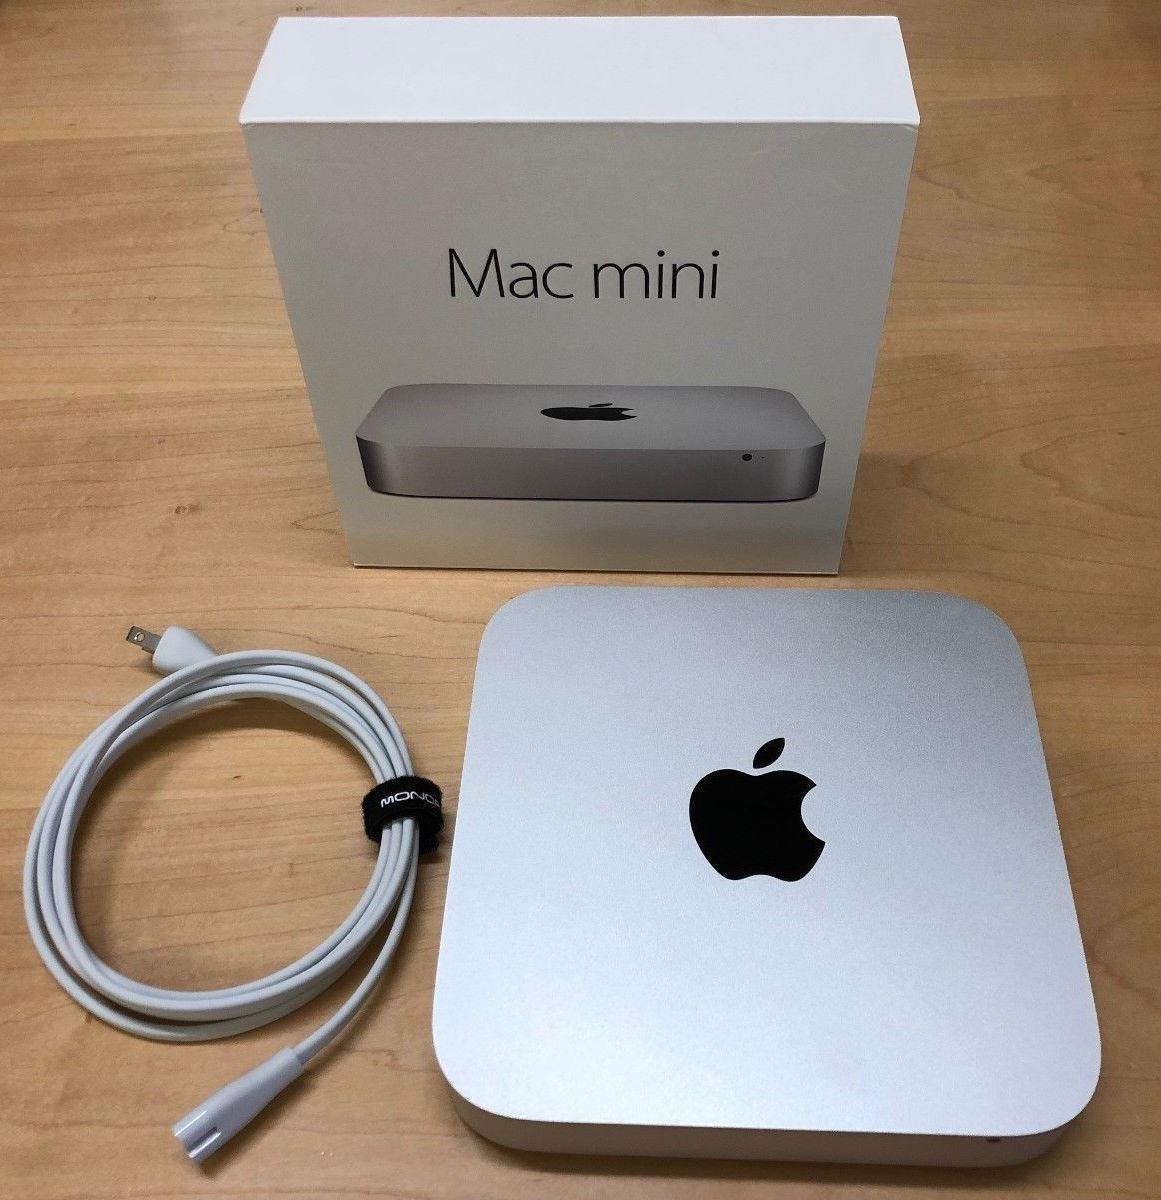 Refurbished Apple A Grade Desktop Computer Mac mini Aluminum Unibody 2.6GHZ Dual Core i5 (Late 2014) MGEN2LL/A 8 GB DDR3 1 TB HDD Intel Iris Graphics 5100 Sierra 10.12